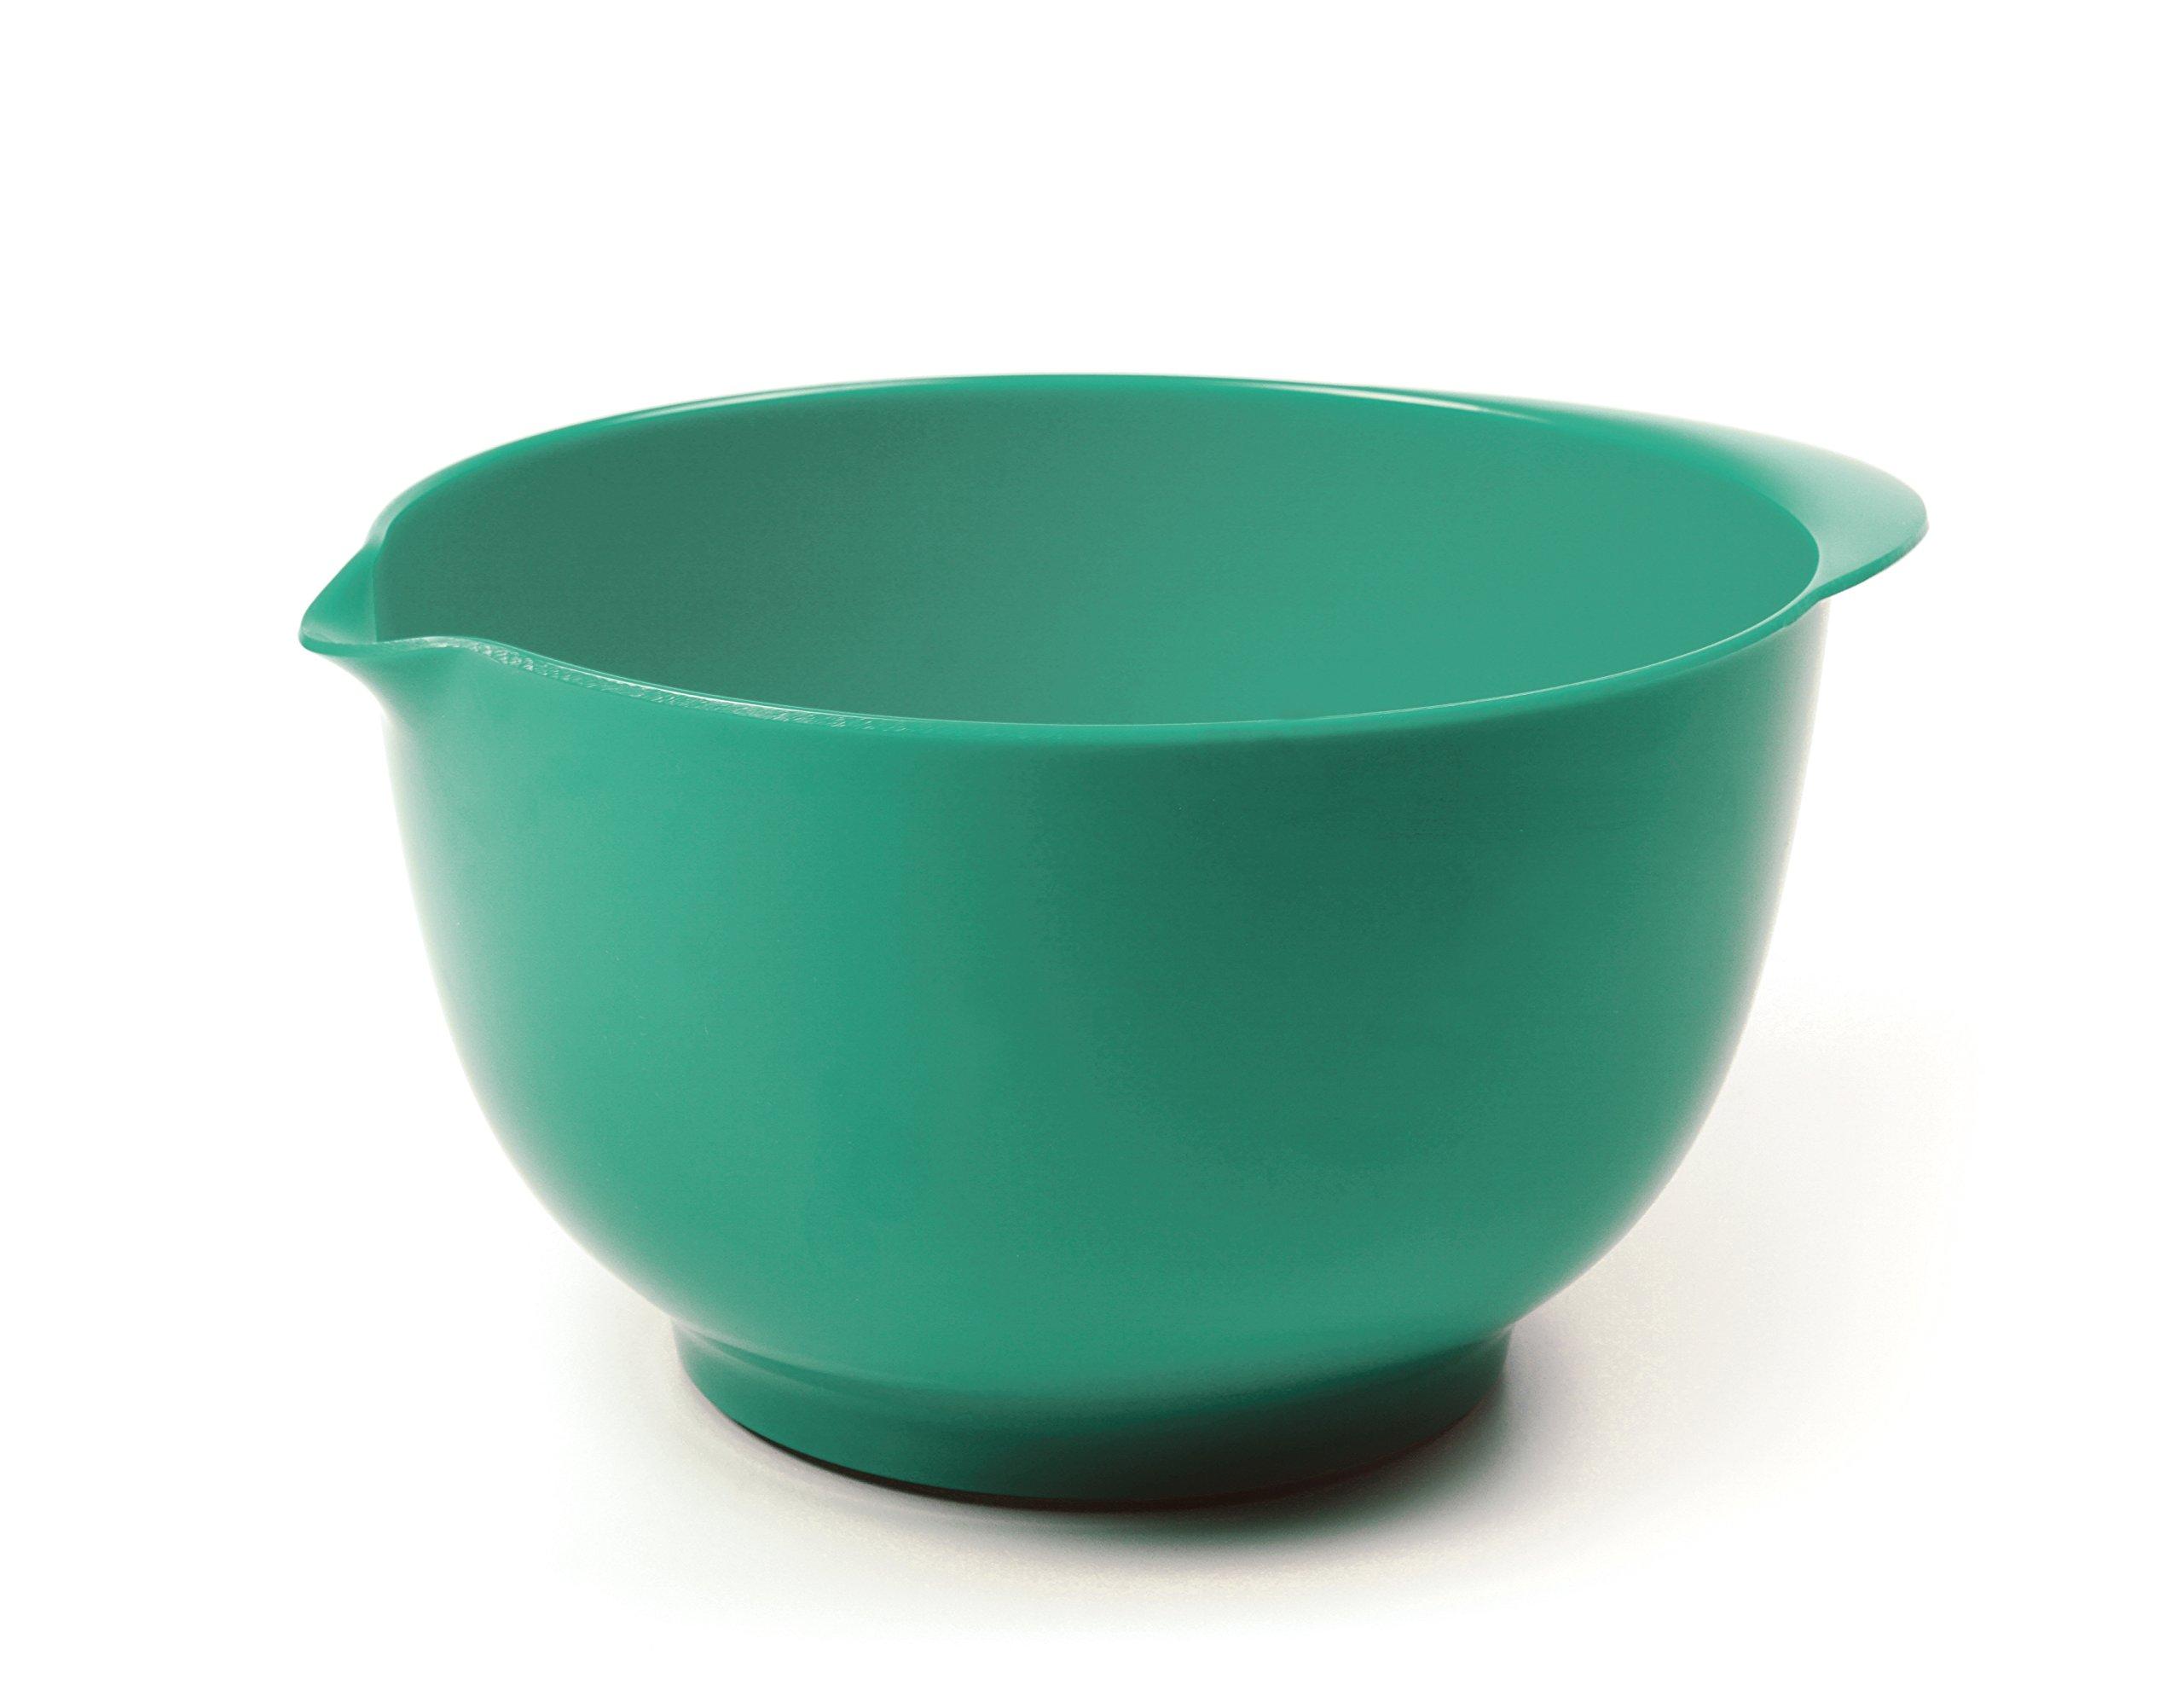 RSVP Melamine Mixing Bowl, Turquoise, 3-Quart